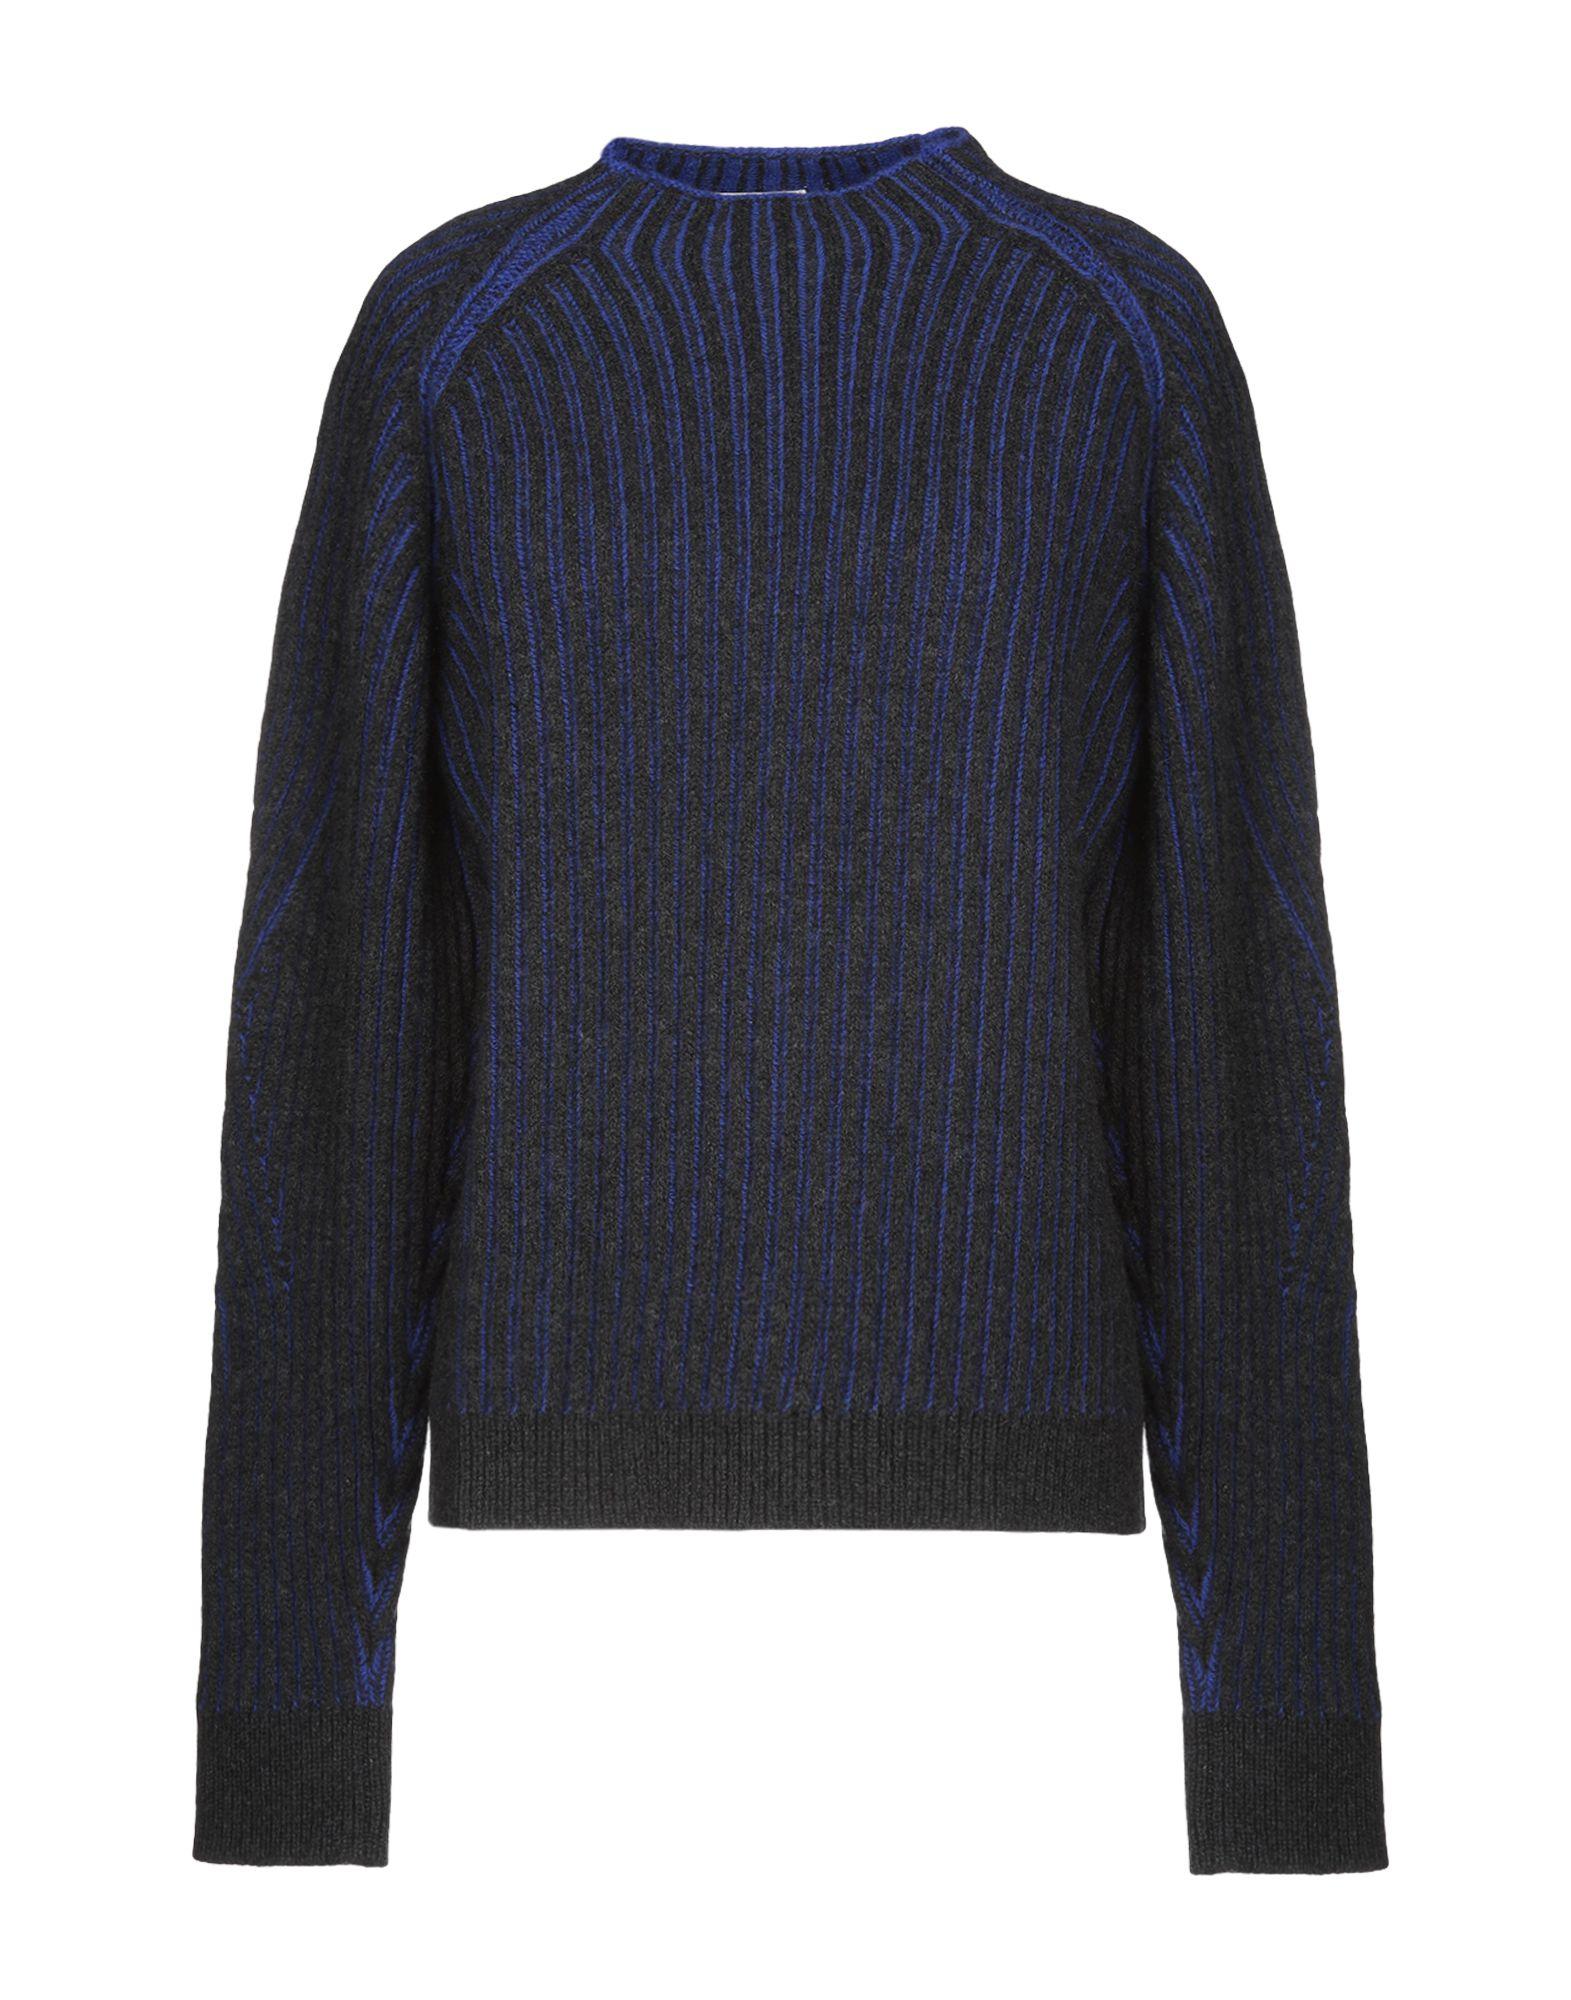 MAISON KITSUNÉ Свитер maison kitsuné свитер